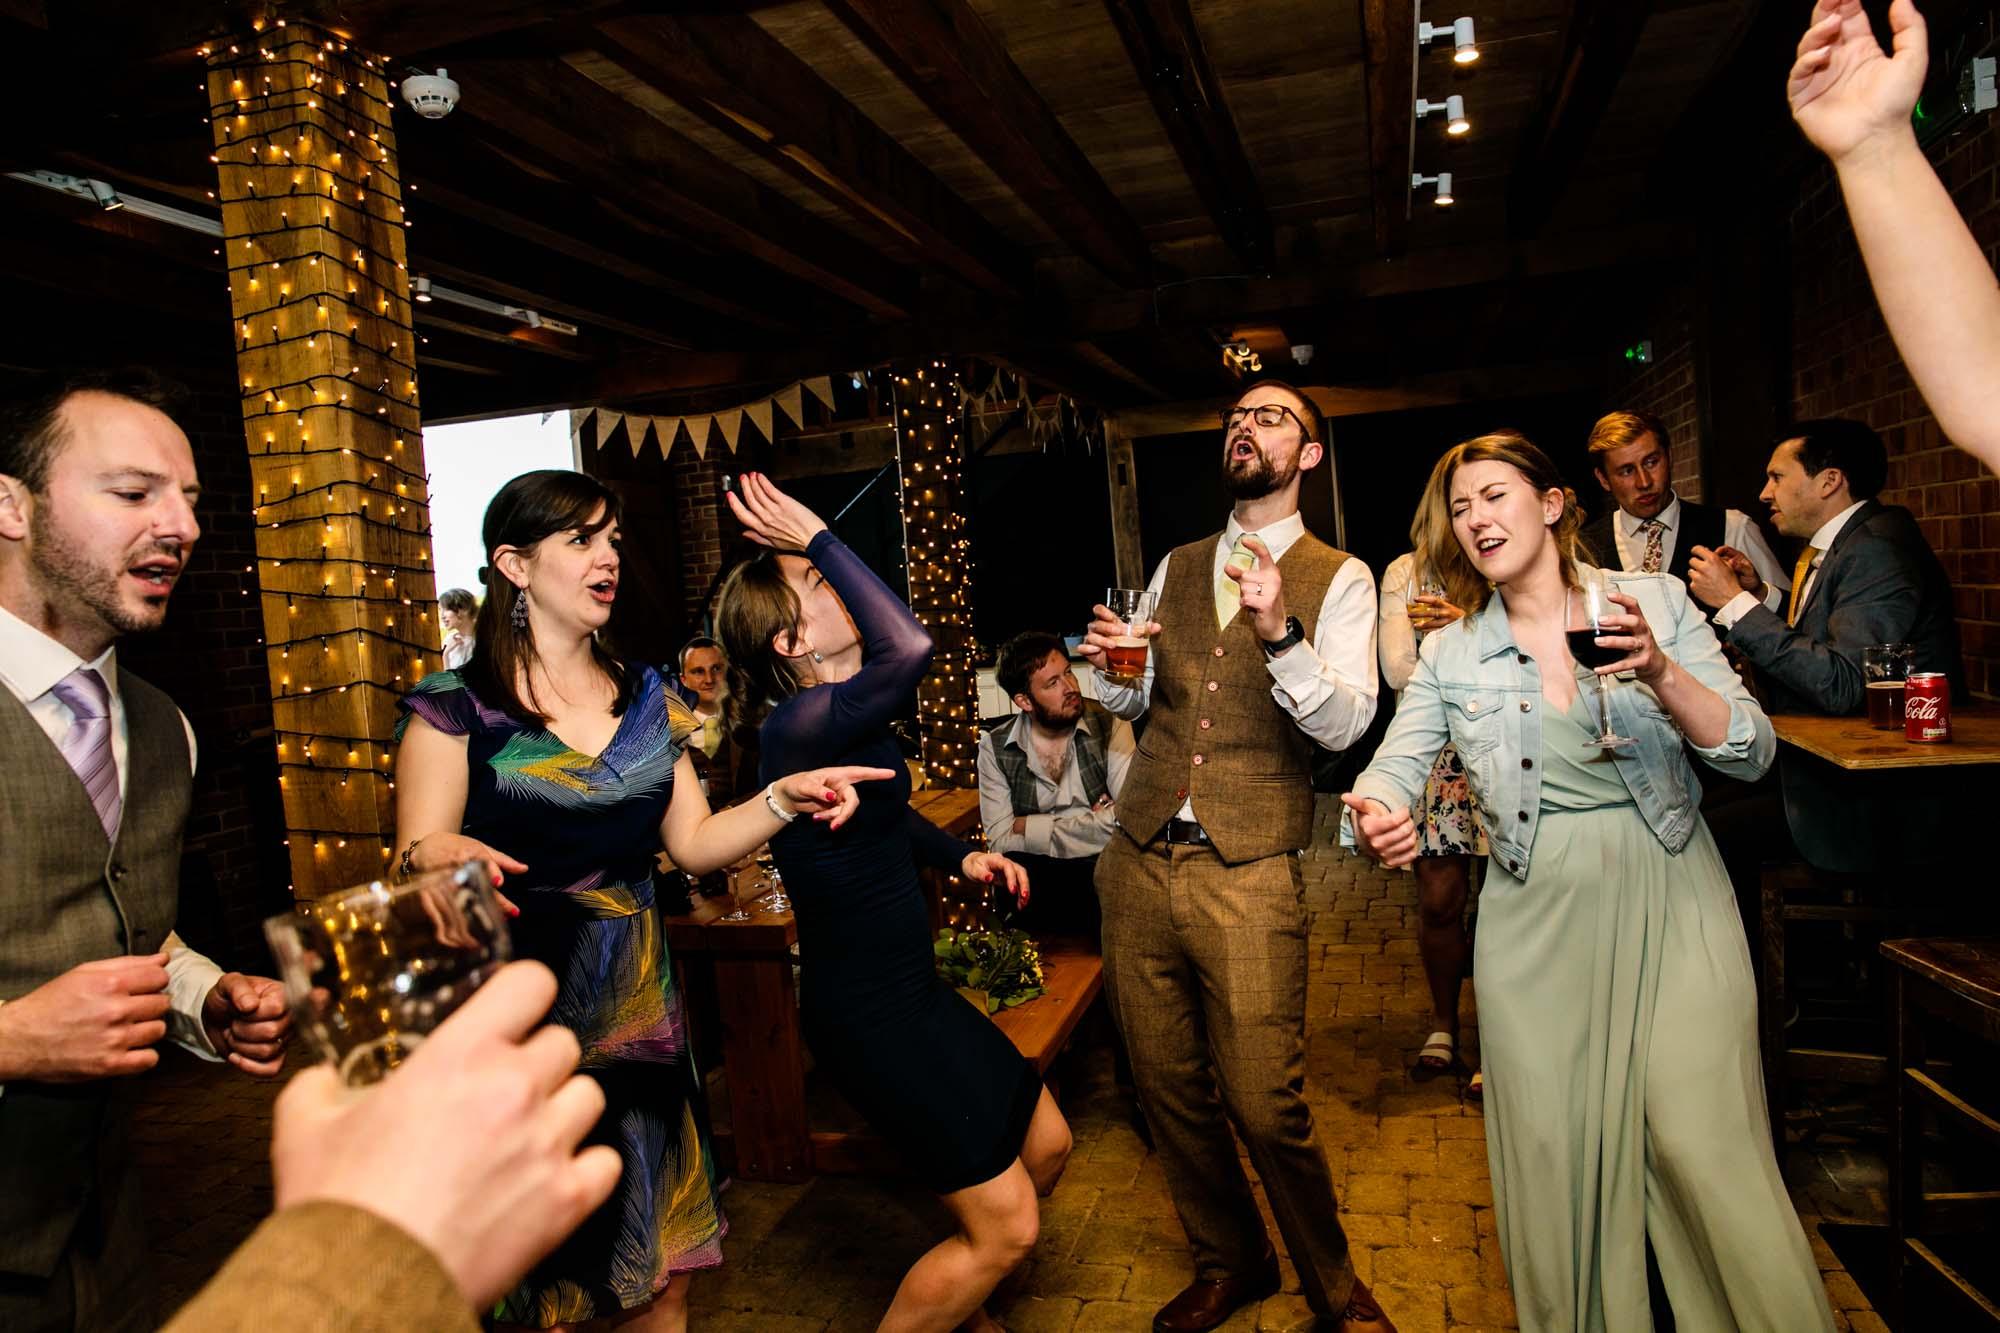 dancefloor at wedding reception